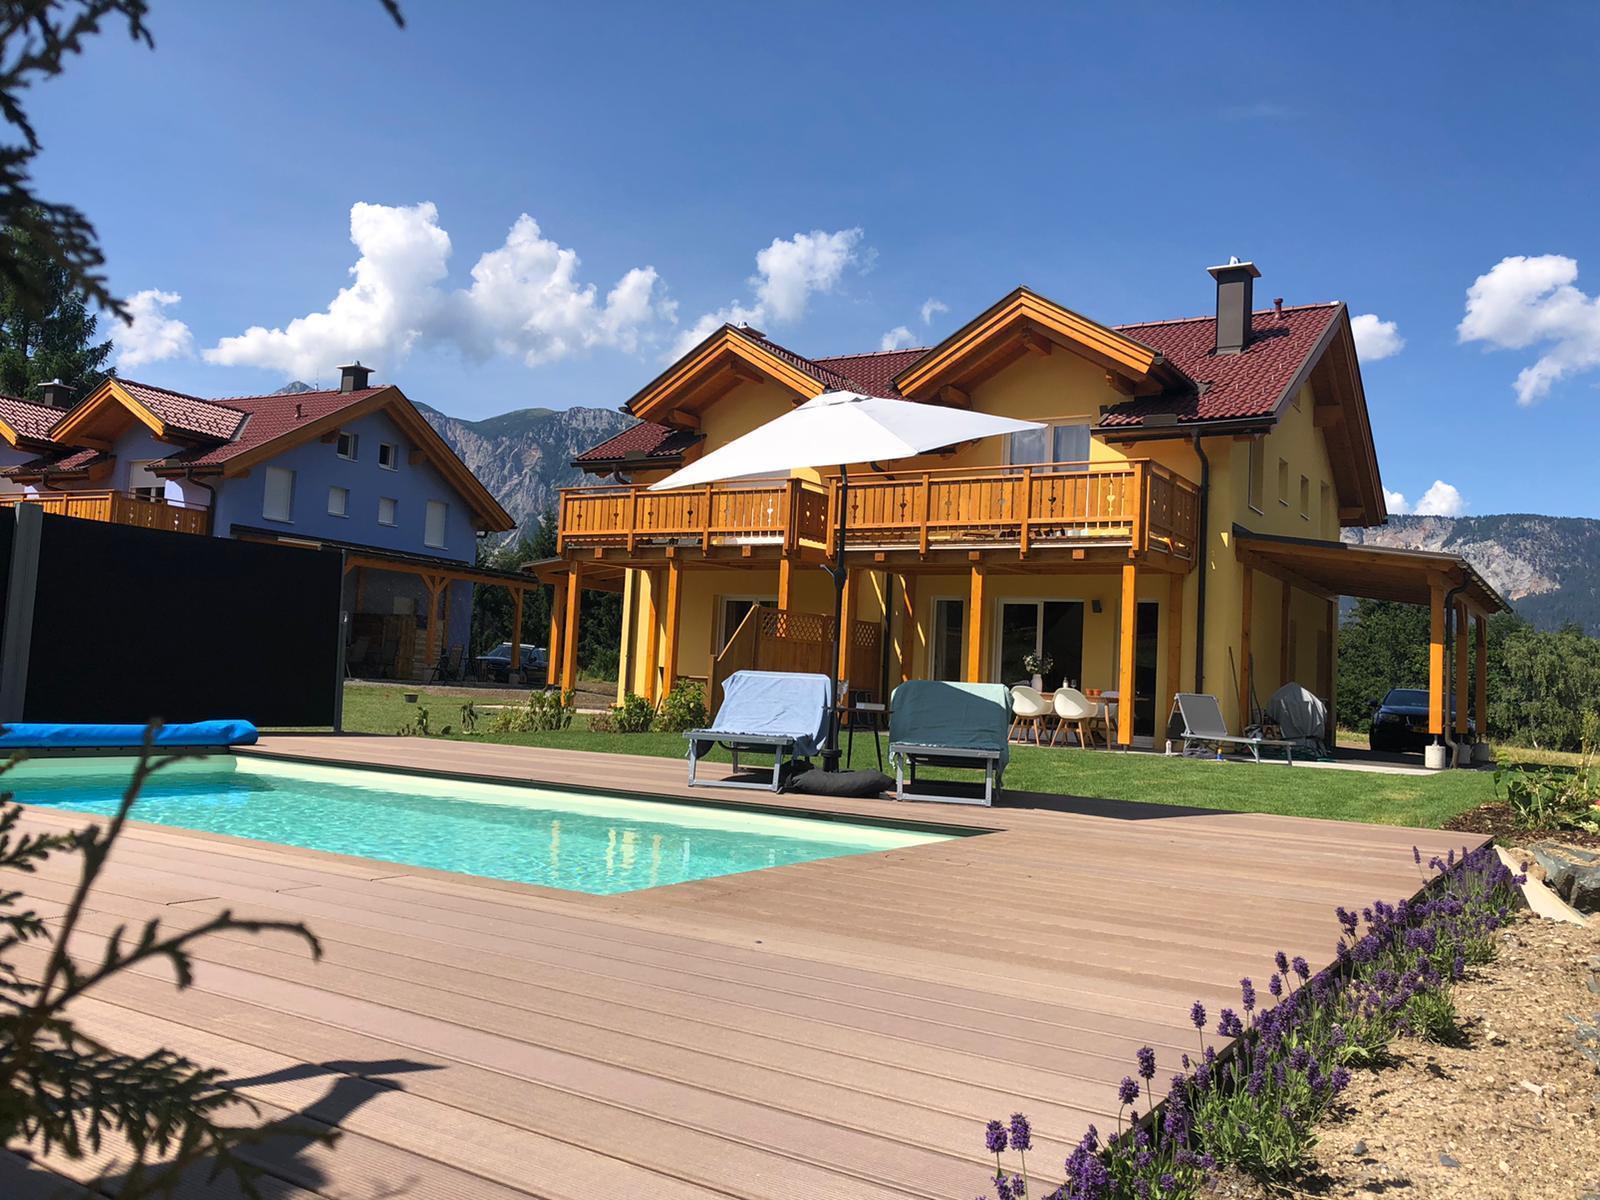 Huis_zomer_zwembad_overview